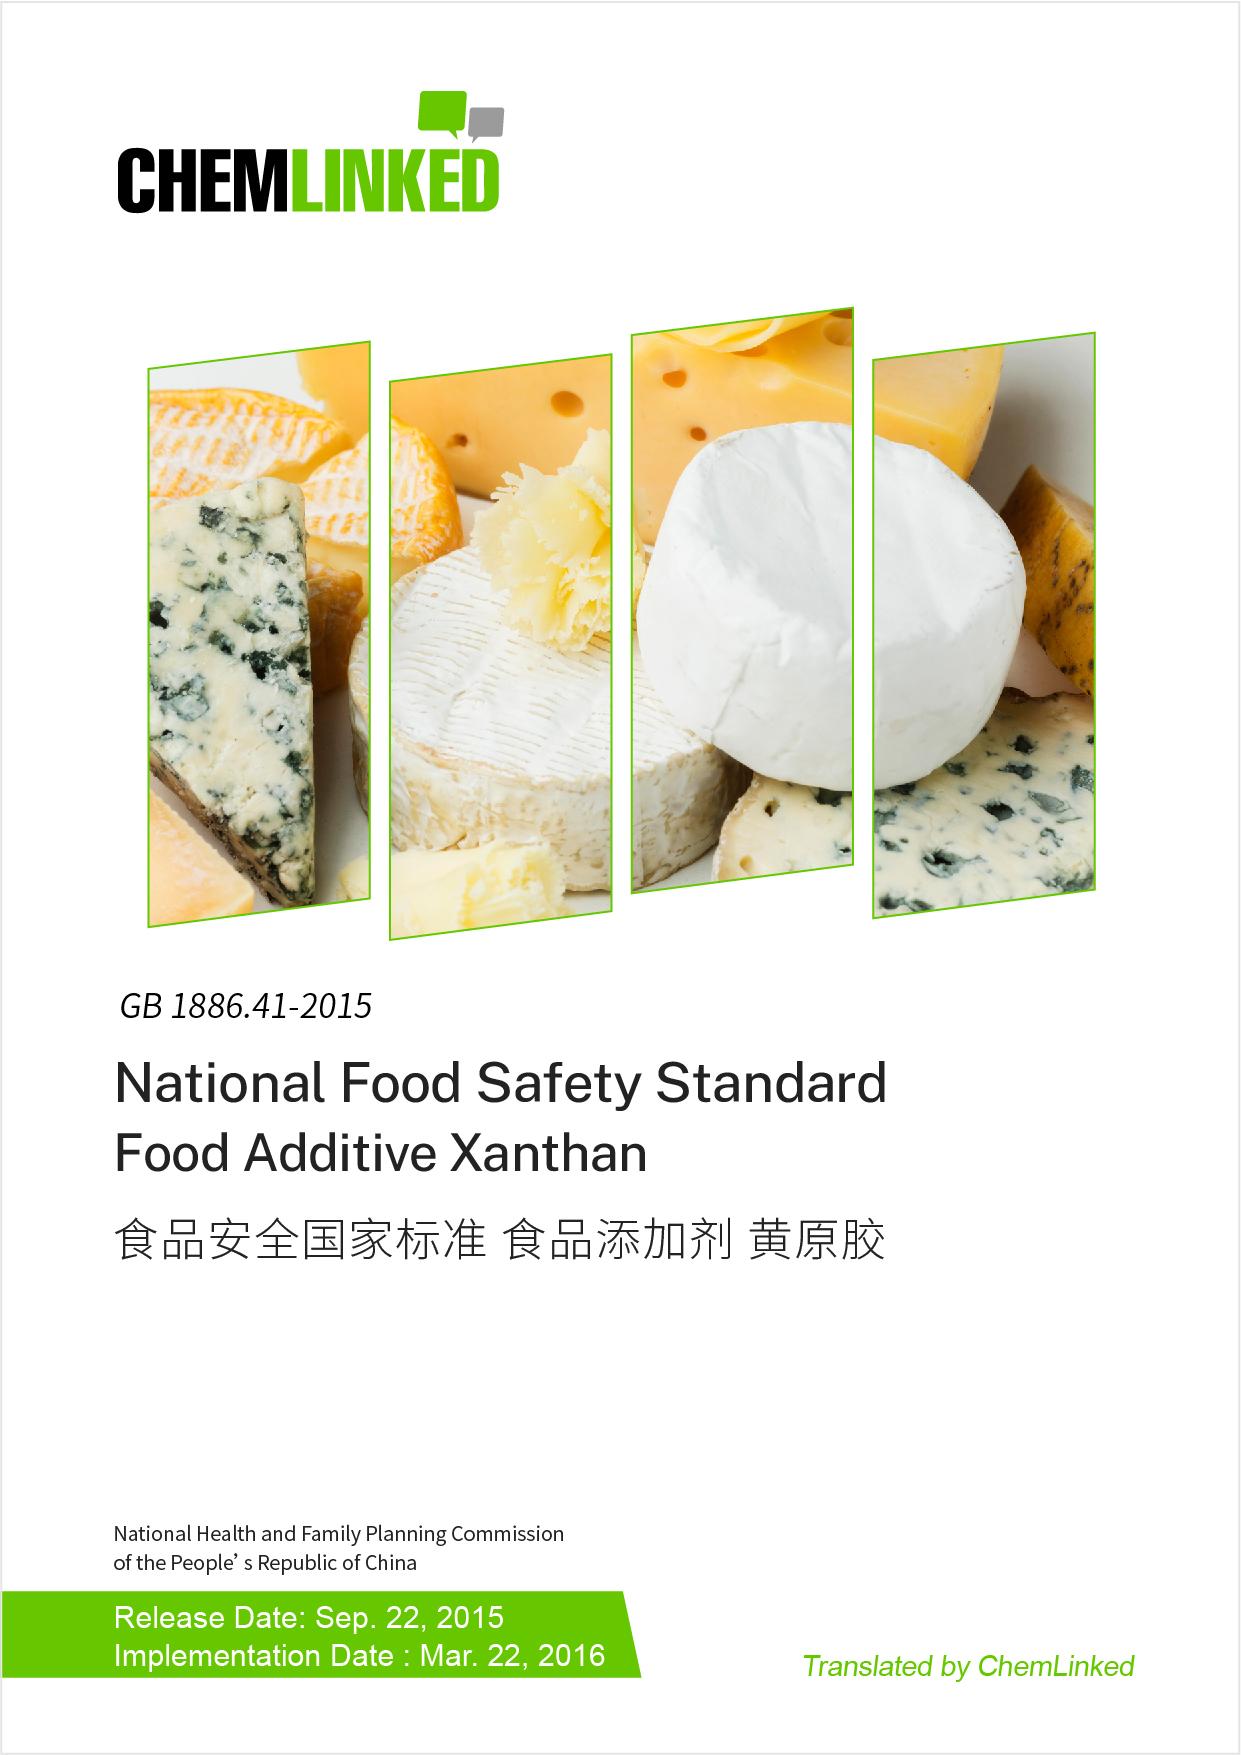 GB 1886.41-2015 National Food Safety Standard Food Additives Xanthan